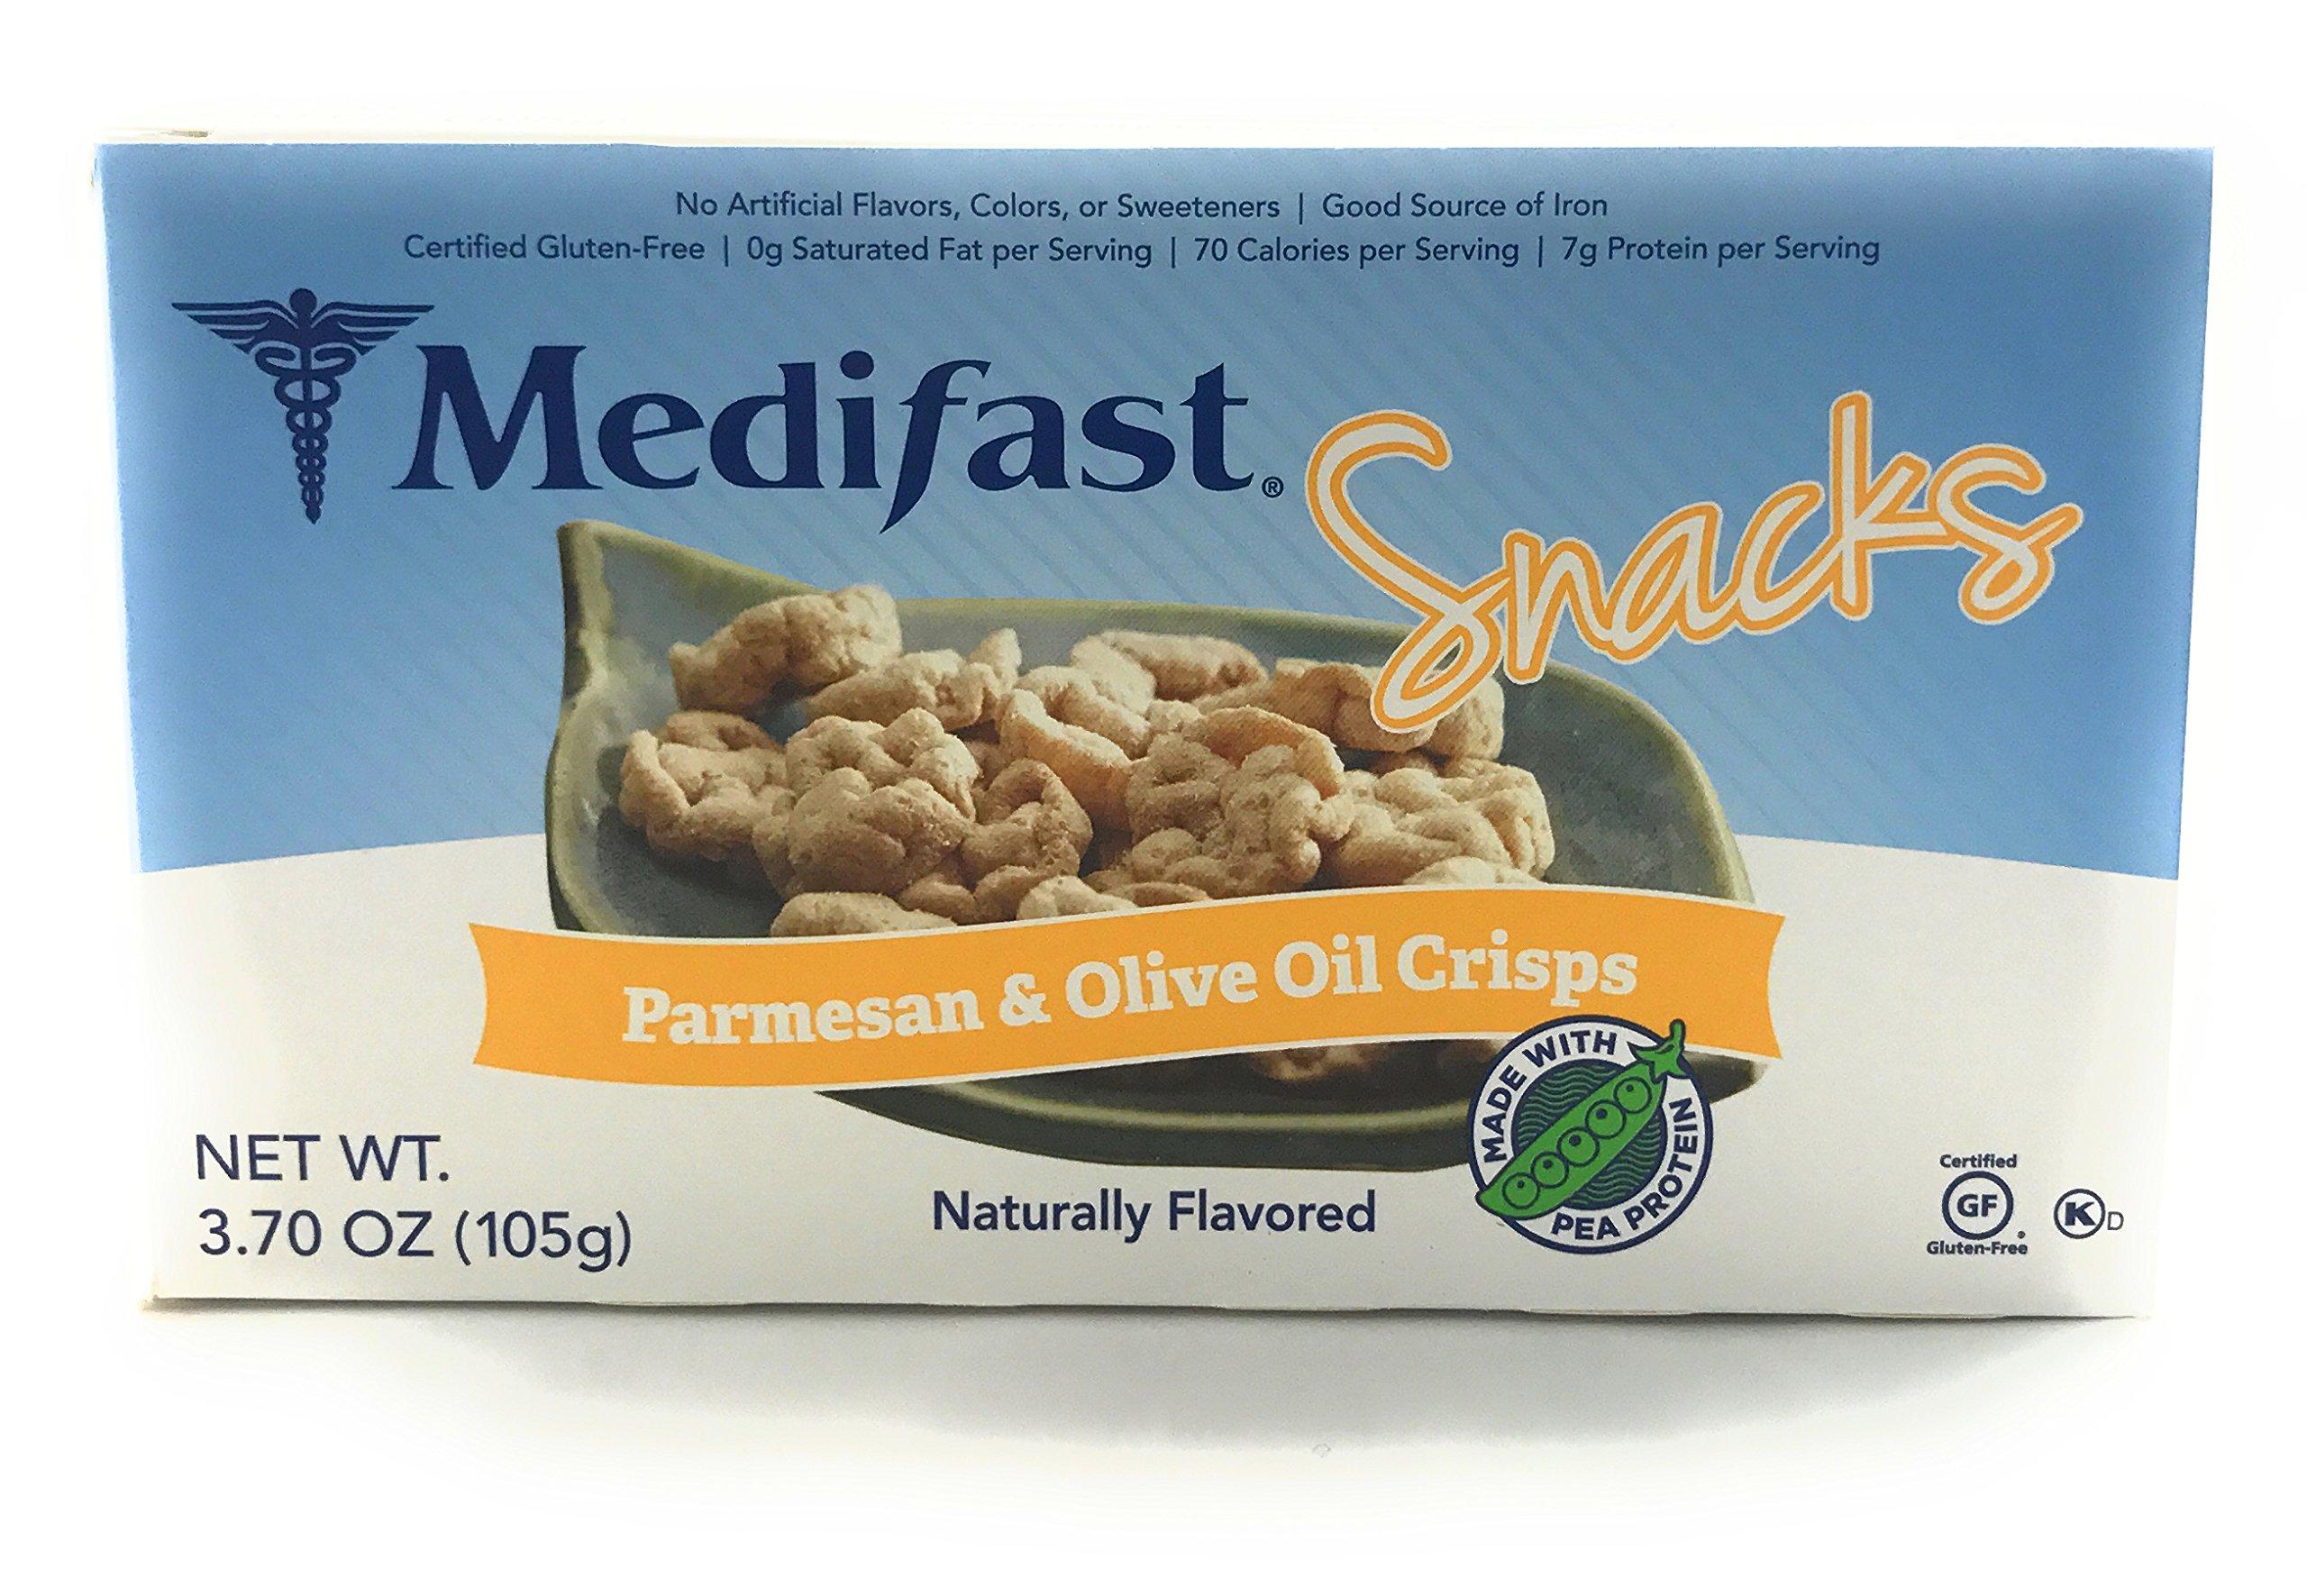 Medifast Snacks Parmesan and Olive Oil Crisps (1 Box/7 Snacks)